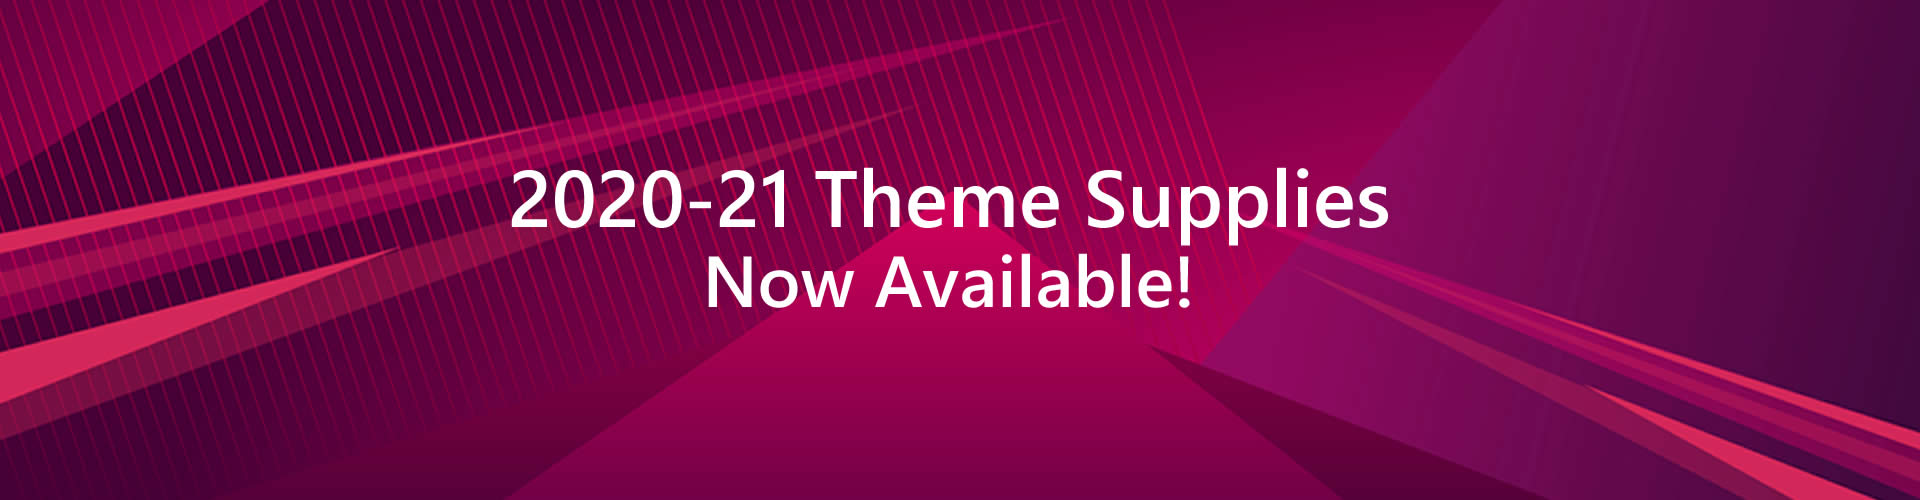 Rotary 2020-21 Theme Supplies